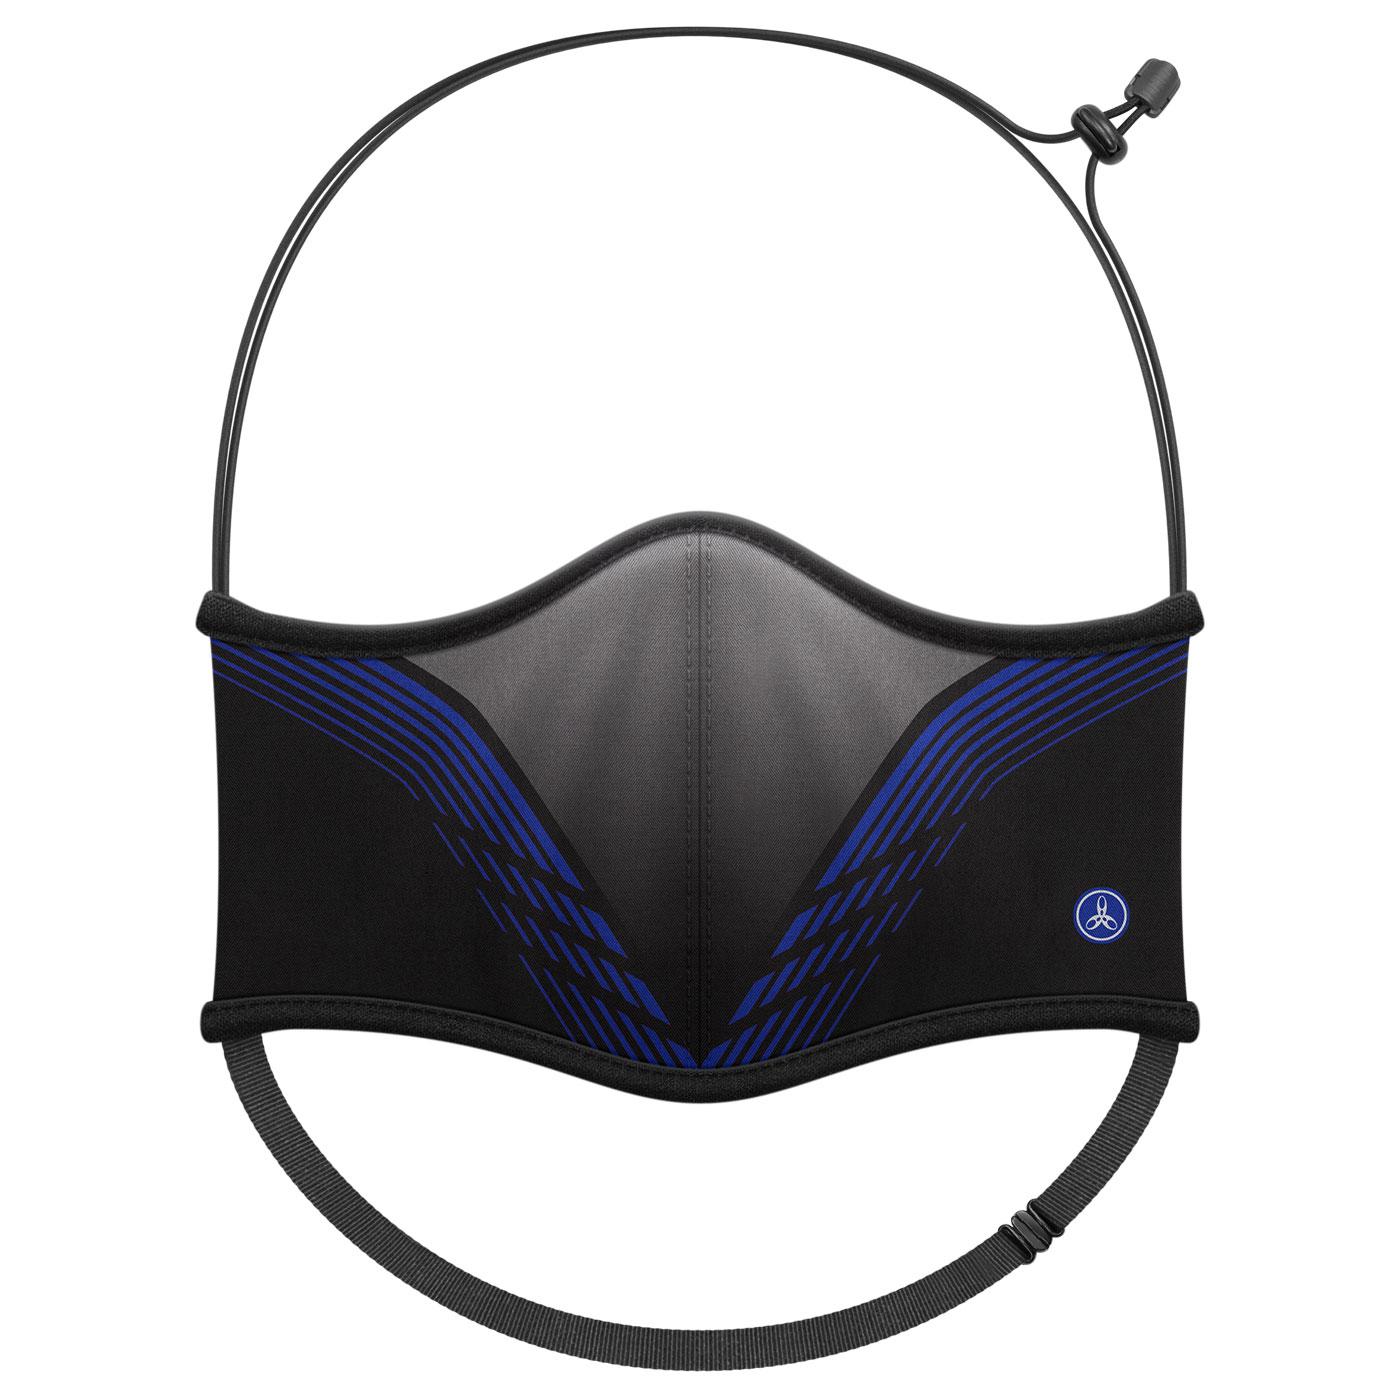 HODARLA 運動舒適口罩6032213 - 黑藍灰